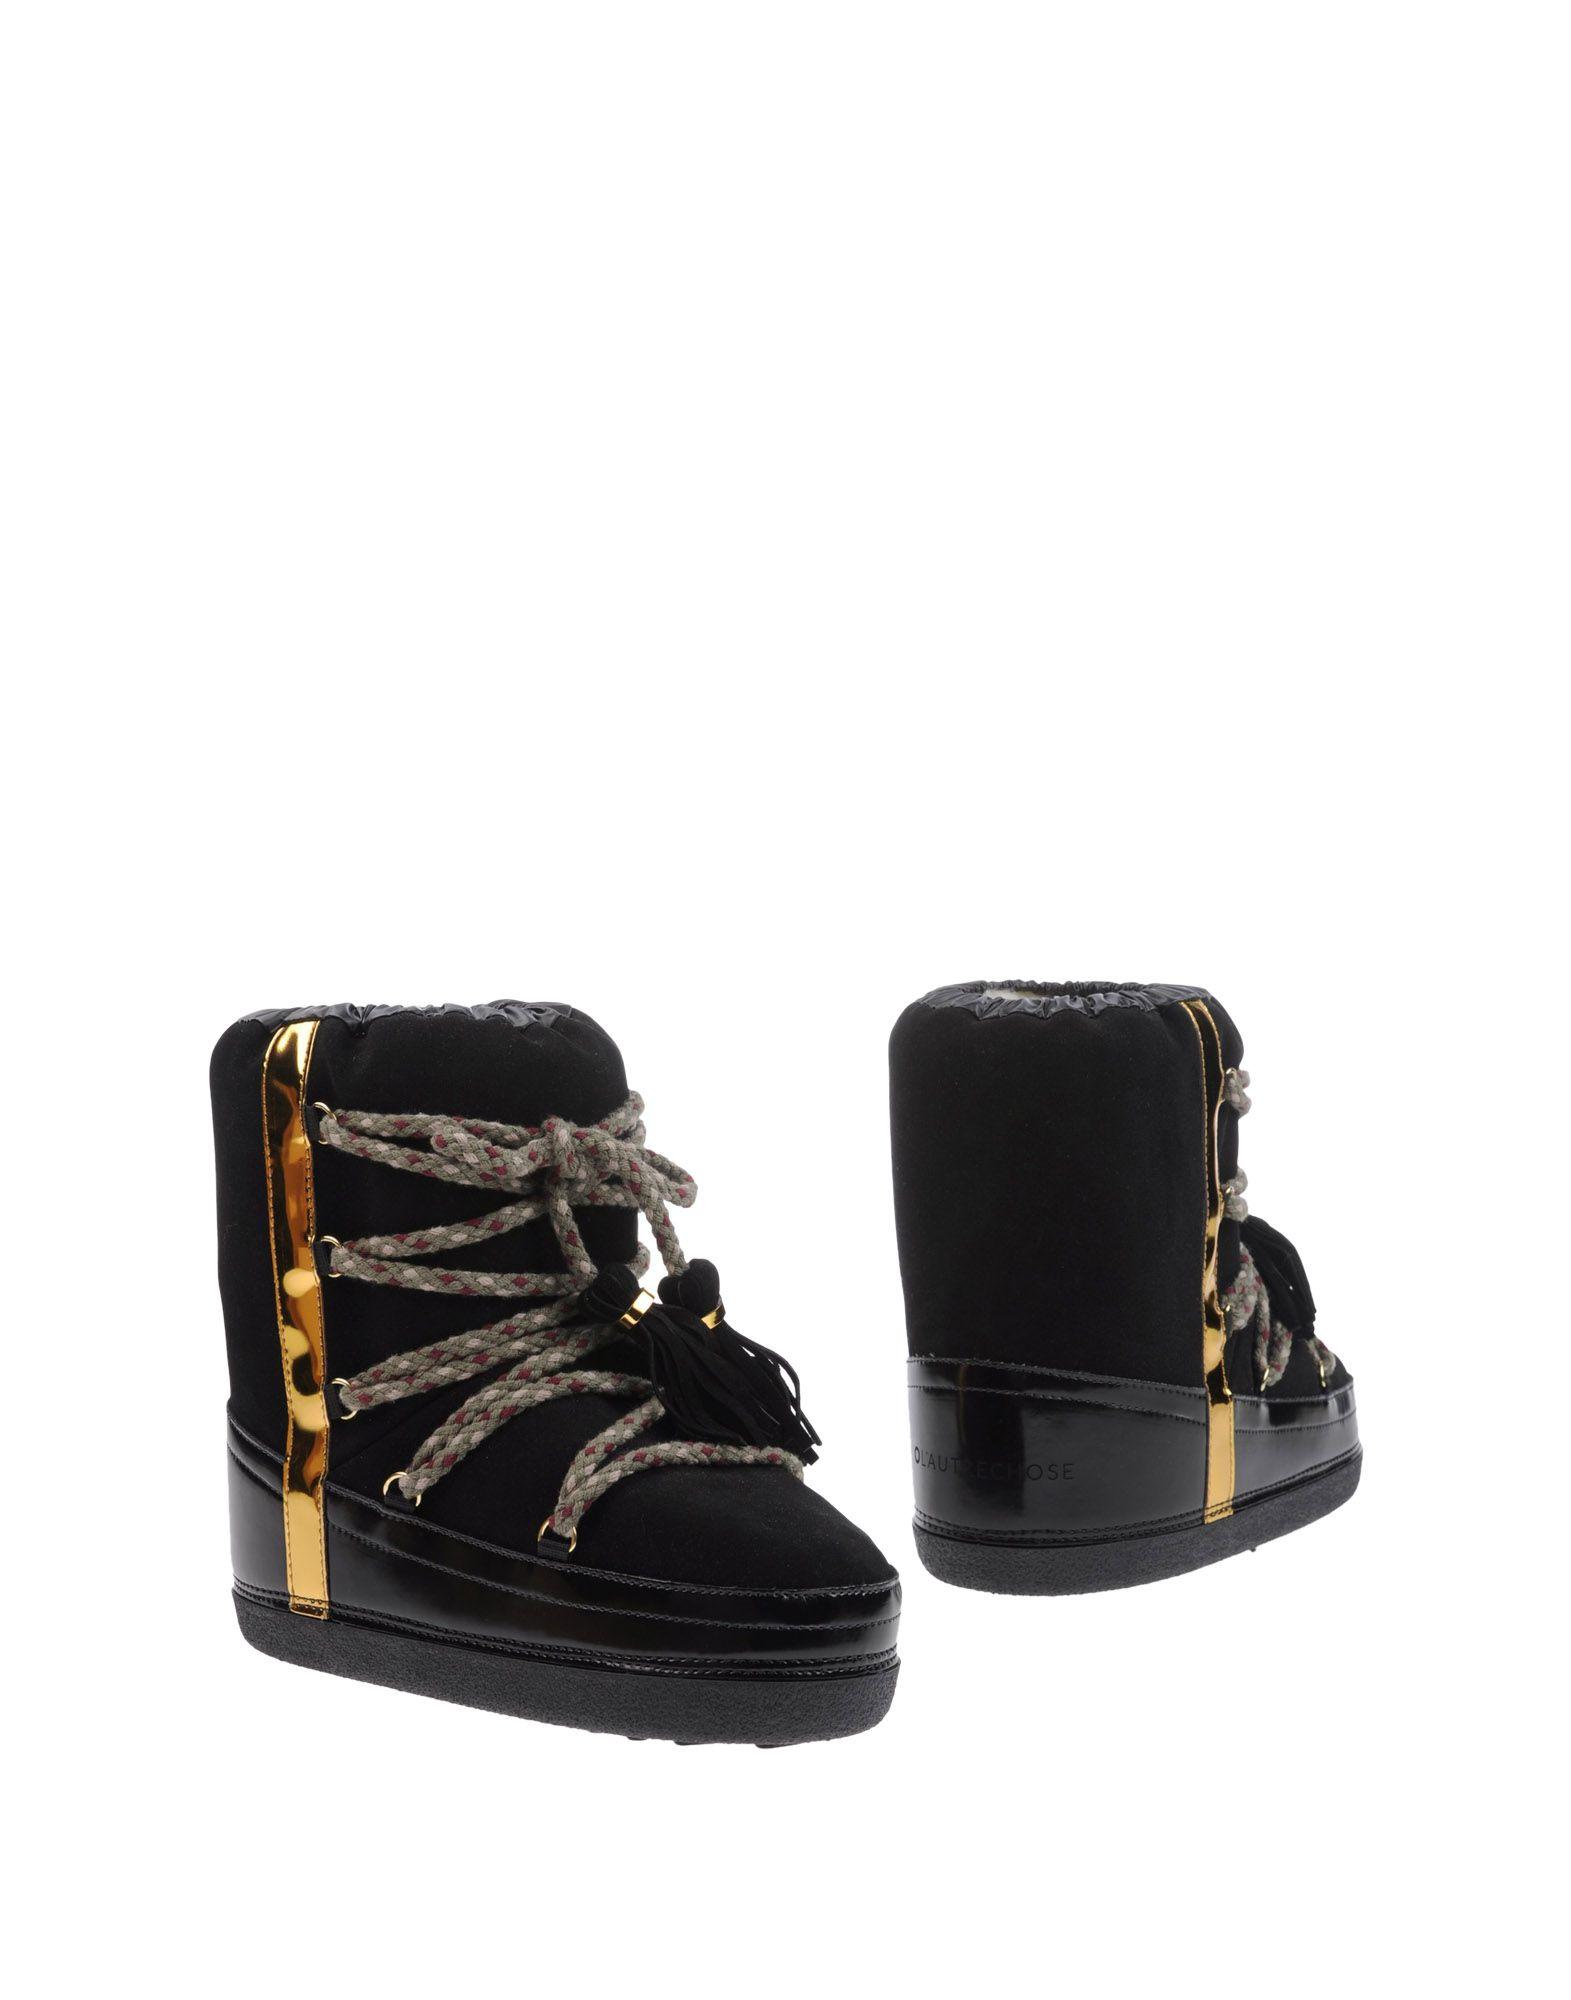 Stilvolle billige Schuhe L' Autre Chose Stiefelette Damen  11226953RI